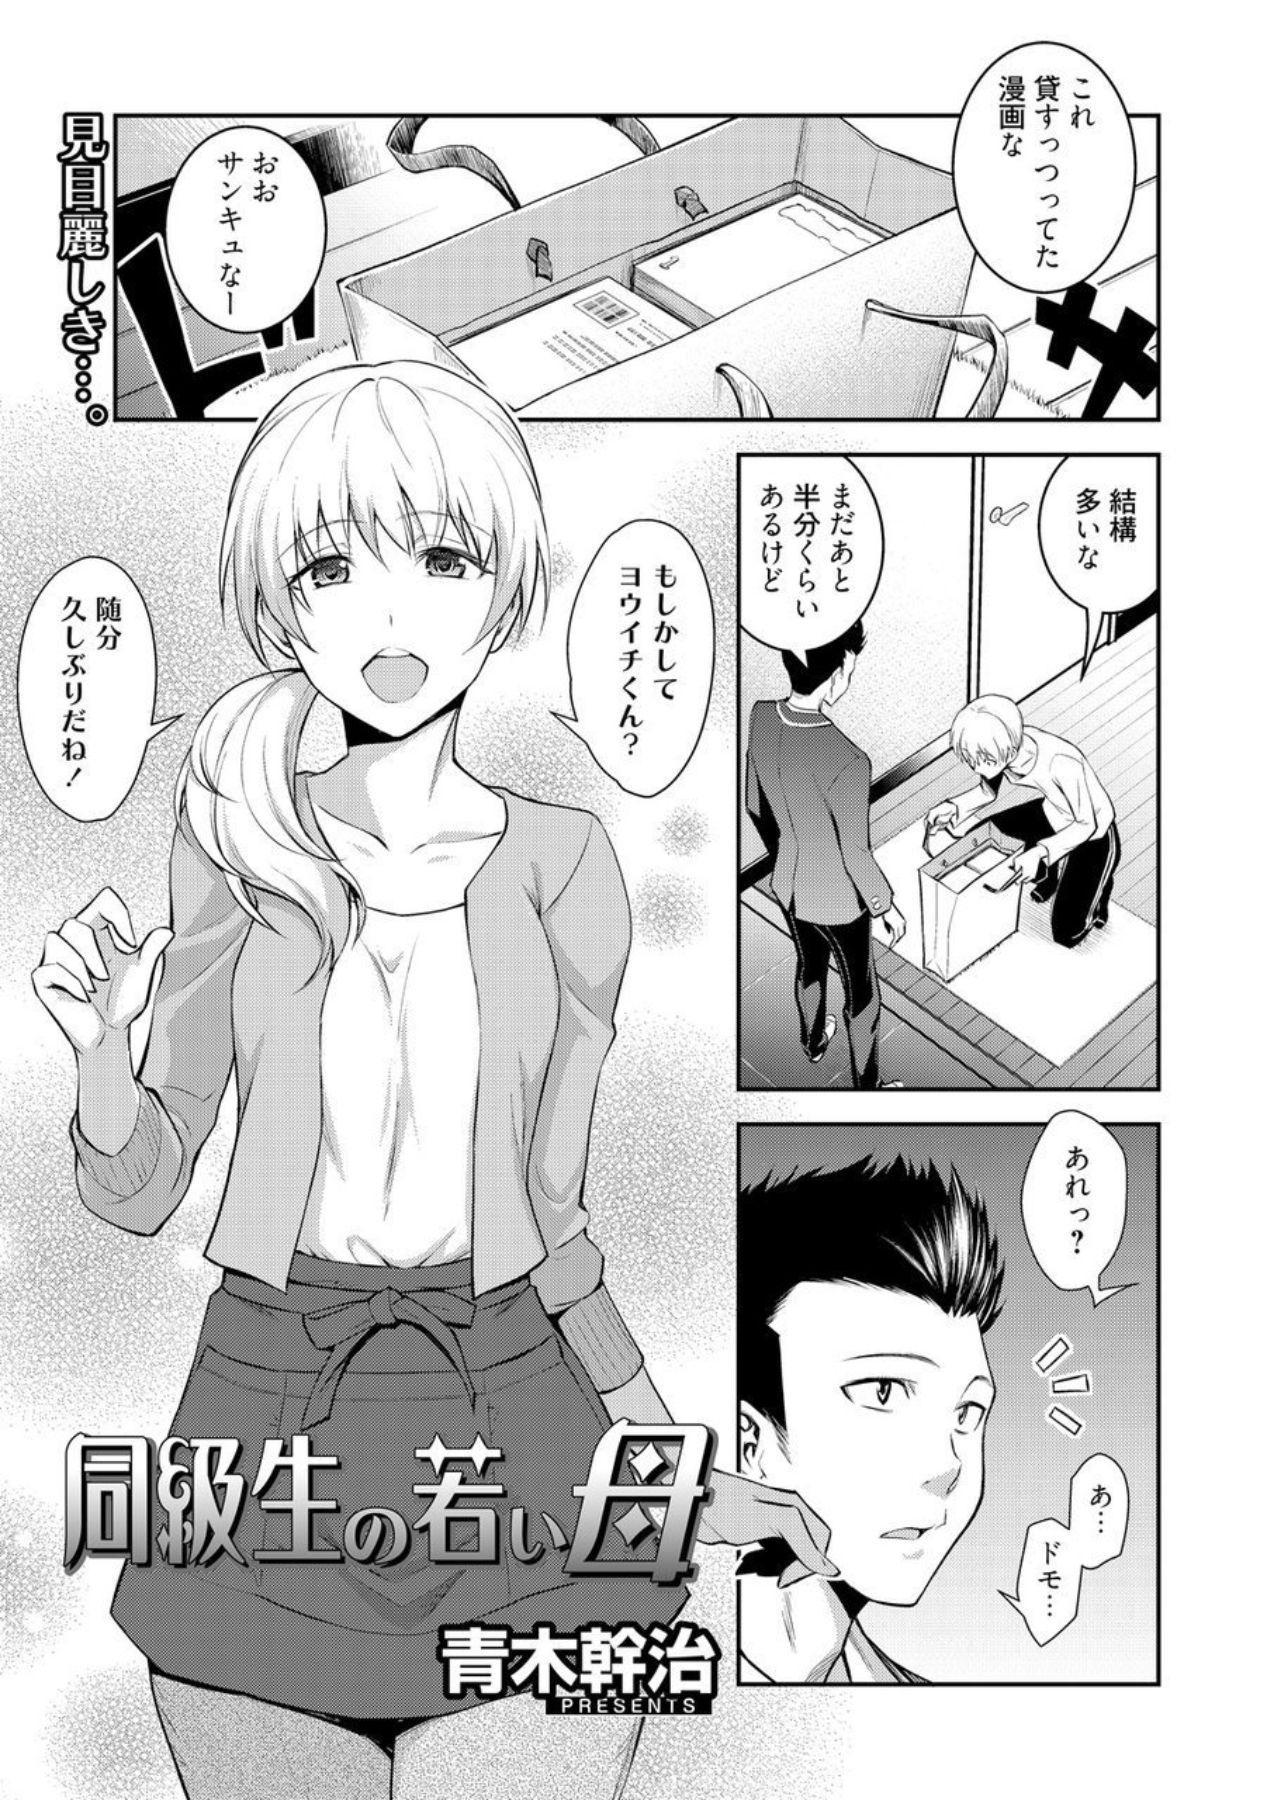 Doukyuusei no Wakai Haha 1